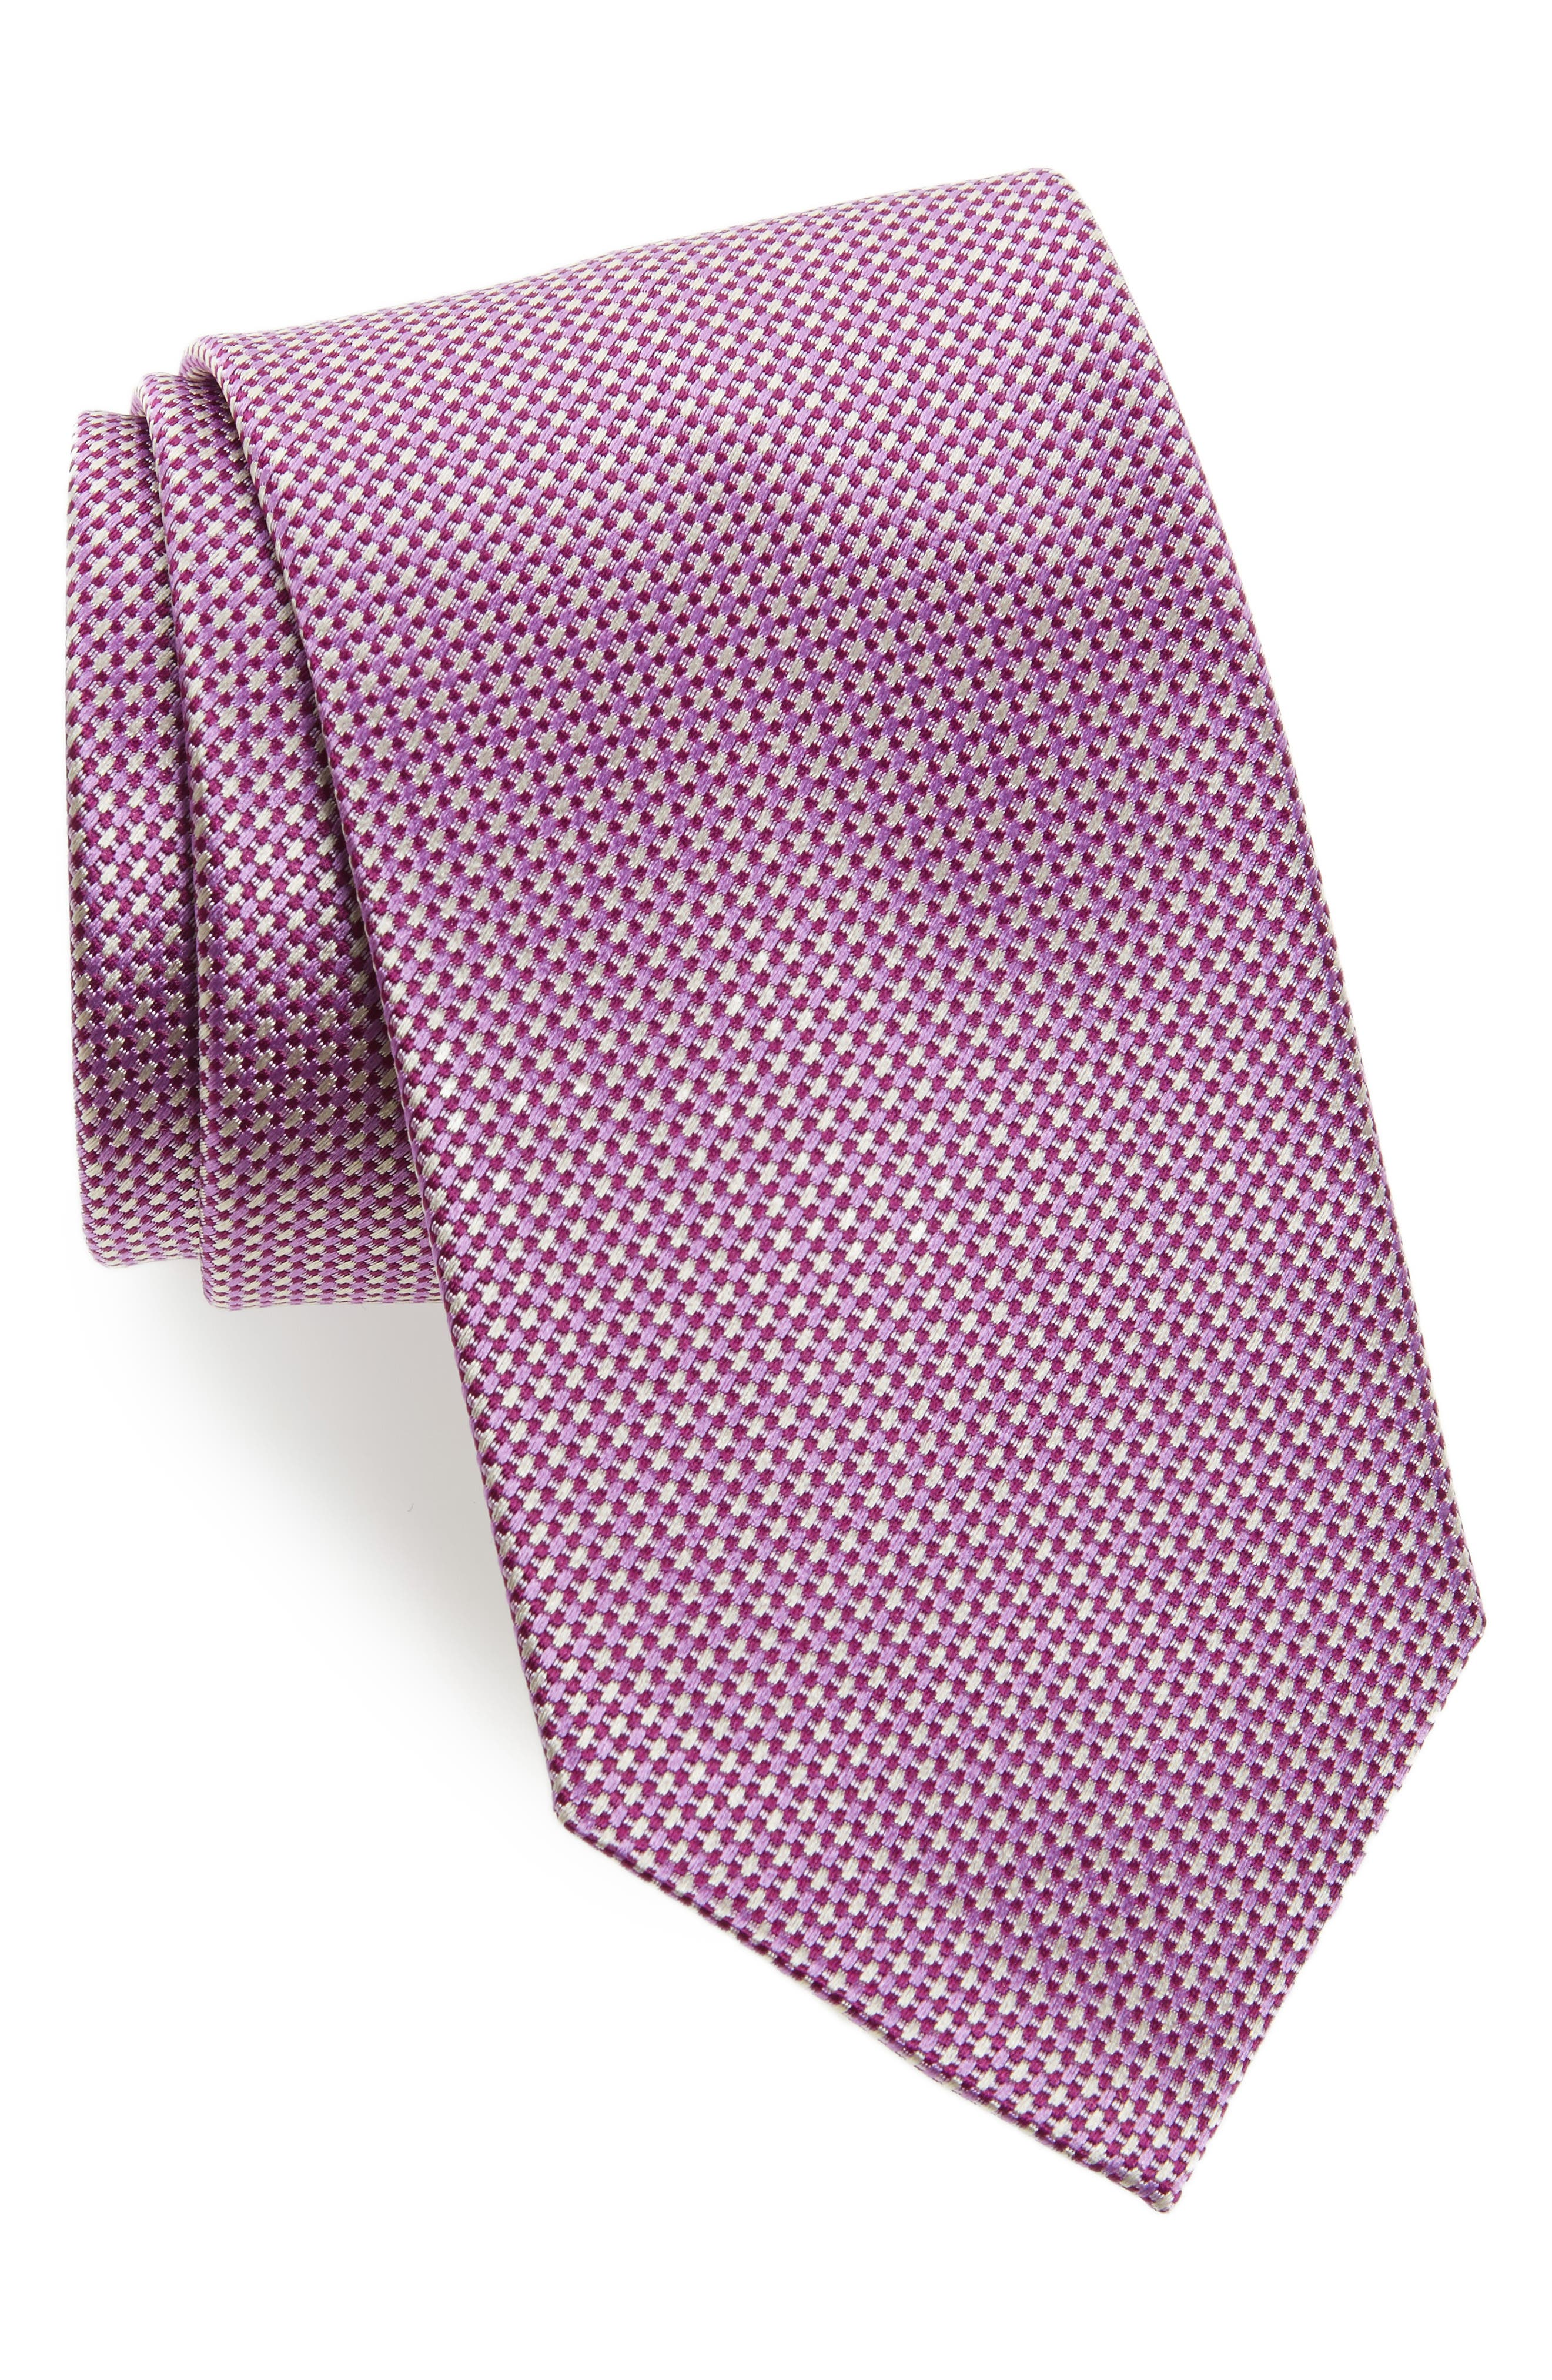 Geometric Silk Tie,                             Main thumbnail 1, color,                             Berry